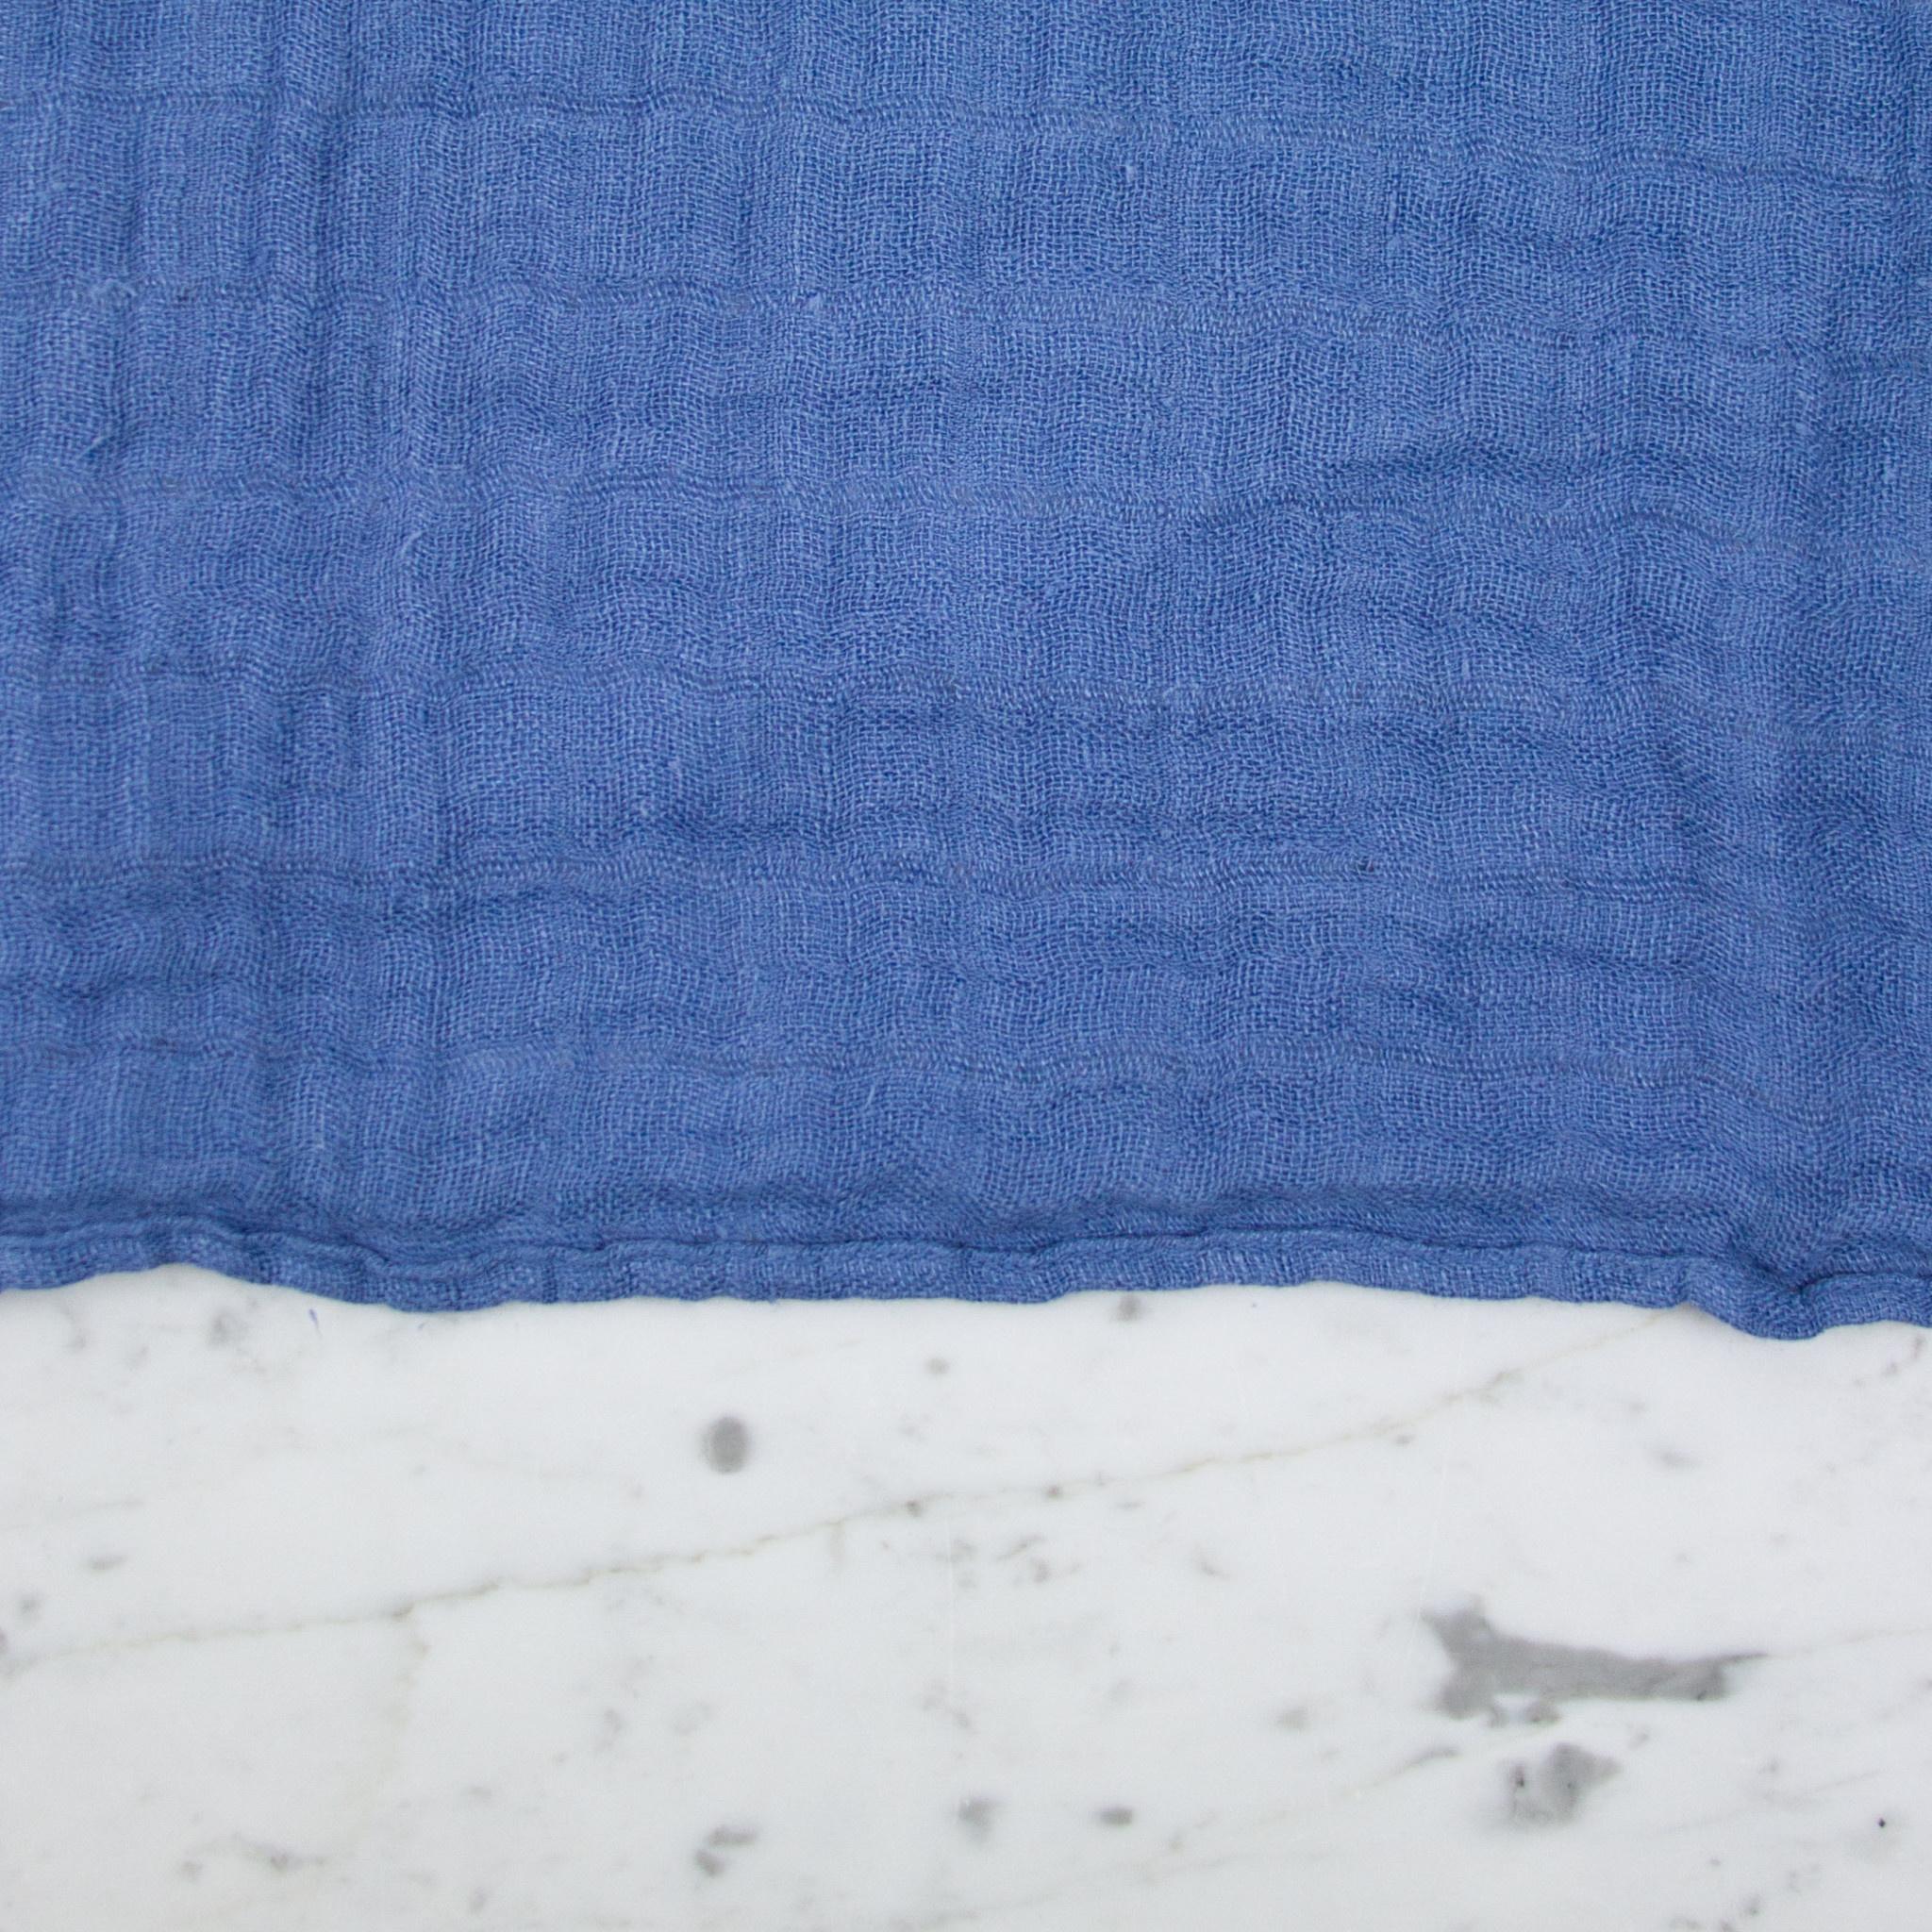 Washed French Linen Gauze Scarf - Atlantic Blue